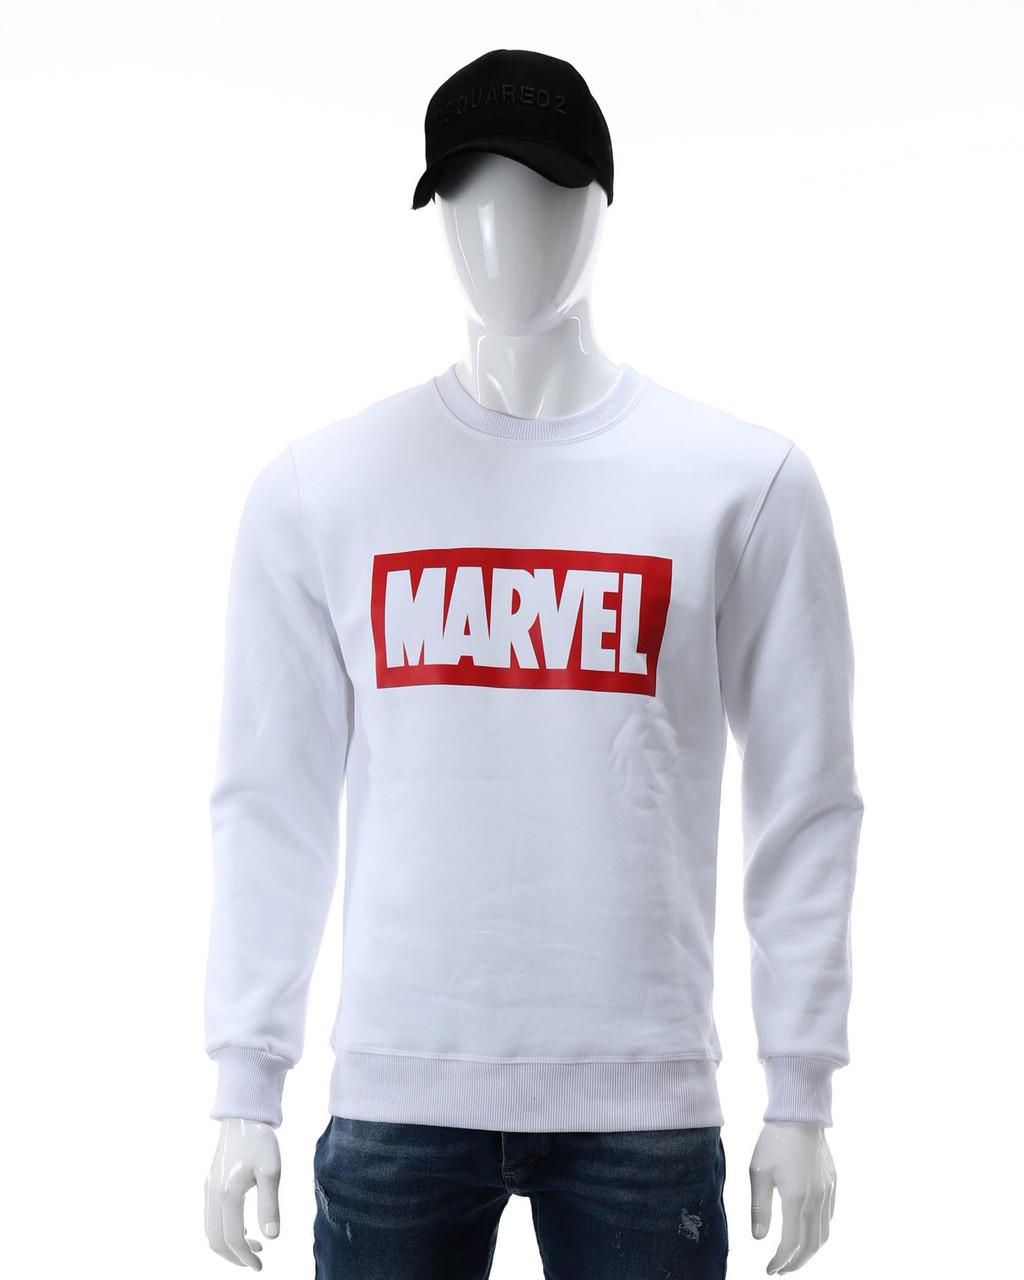 Свитшот осень-зима белый MARVEL с лого WHT L(Р) 18-502-003